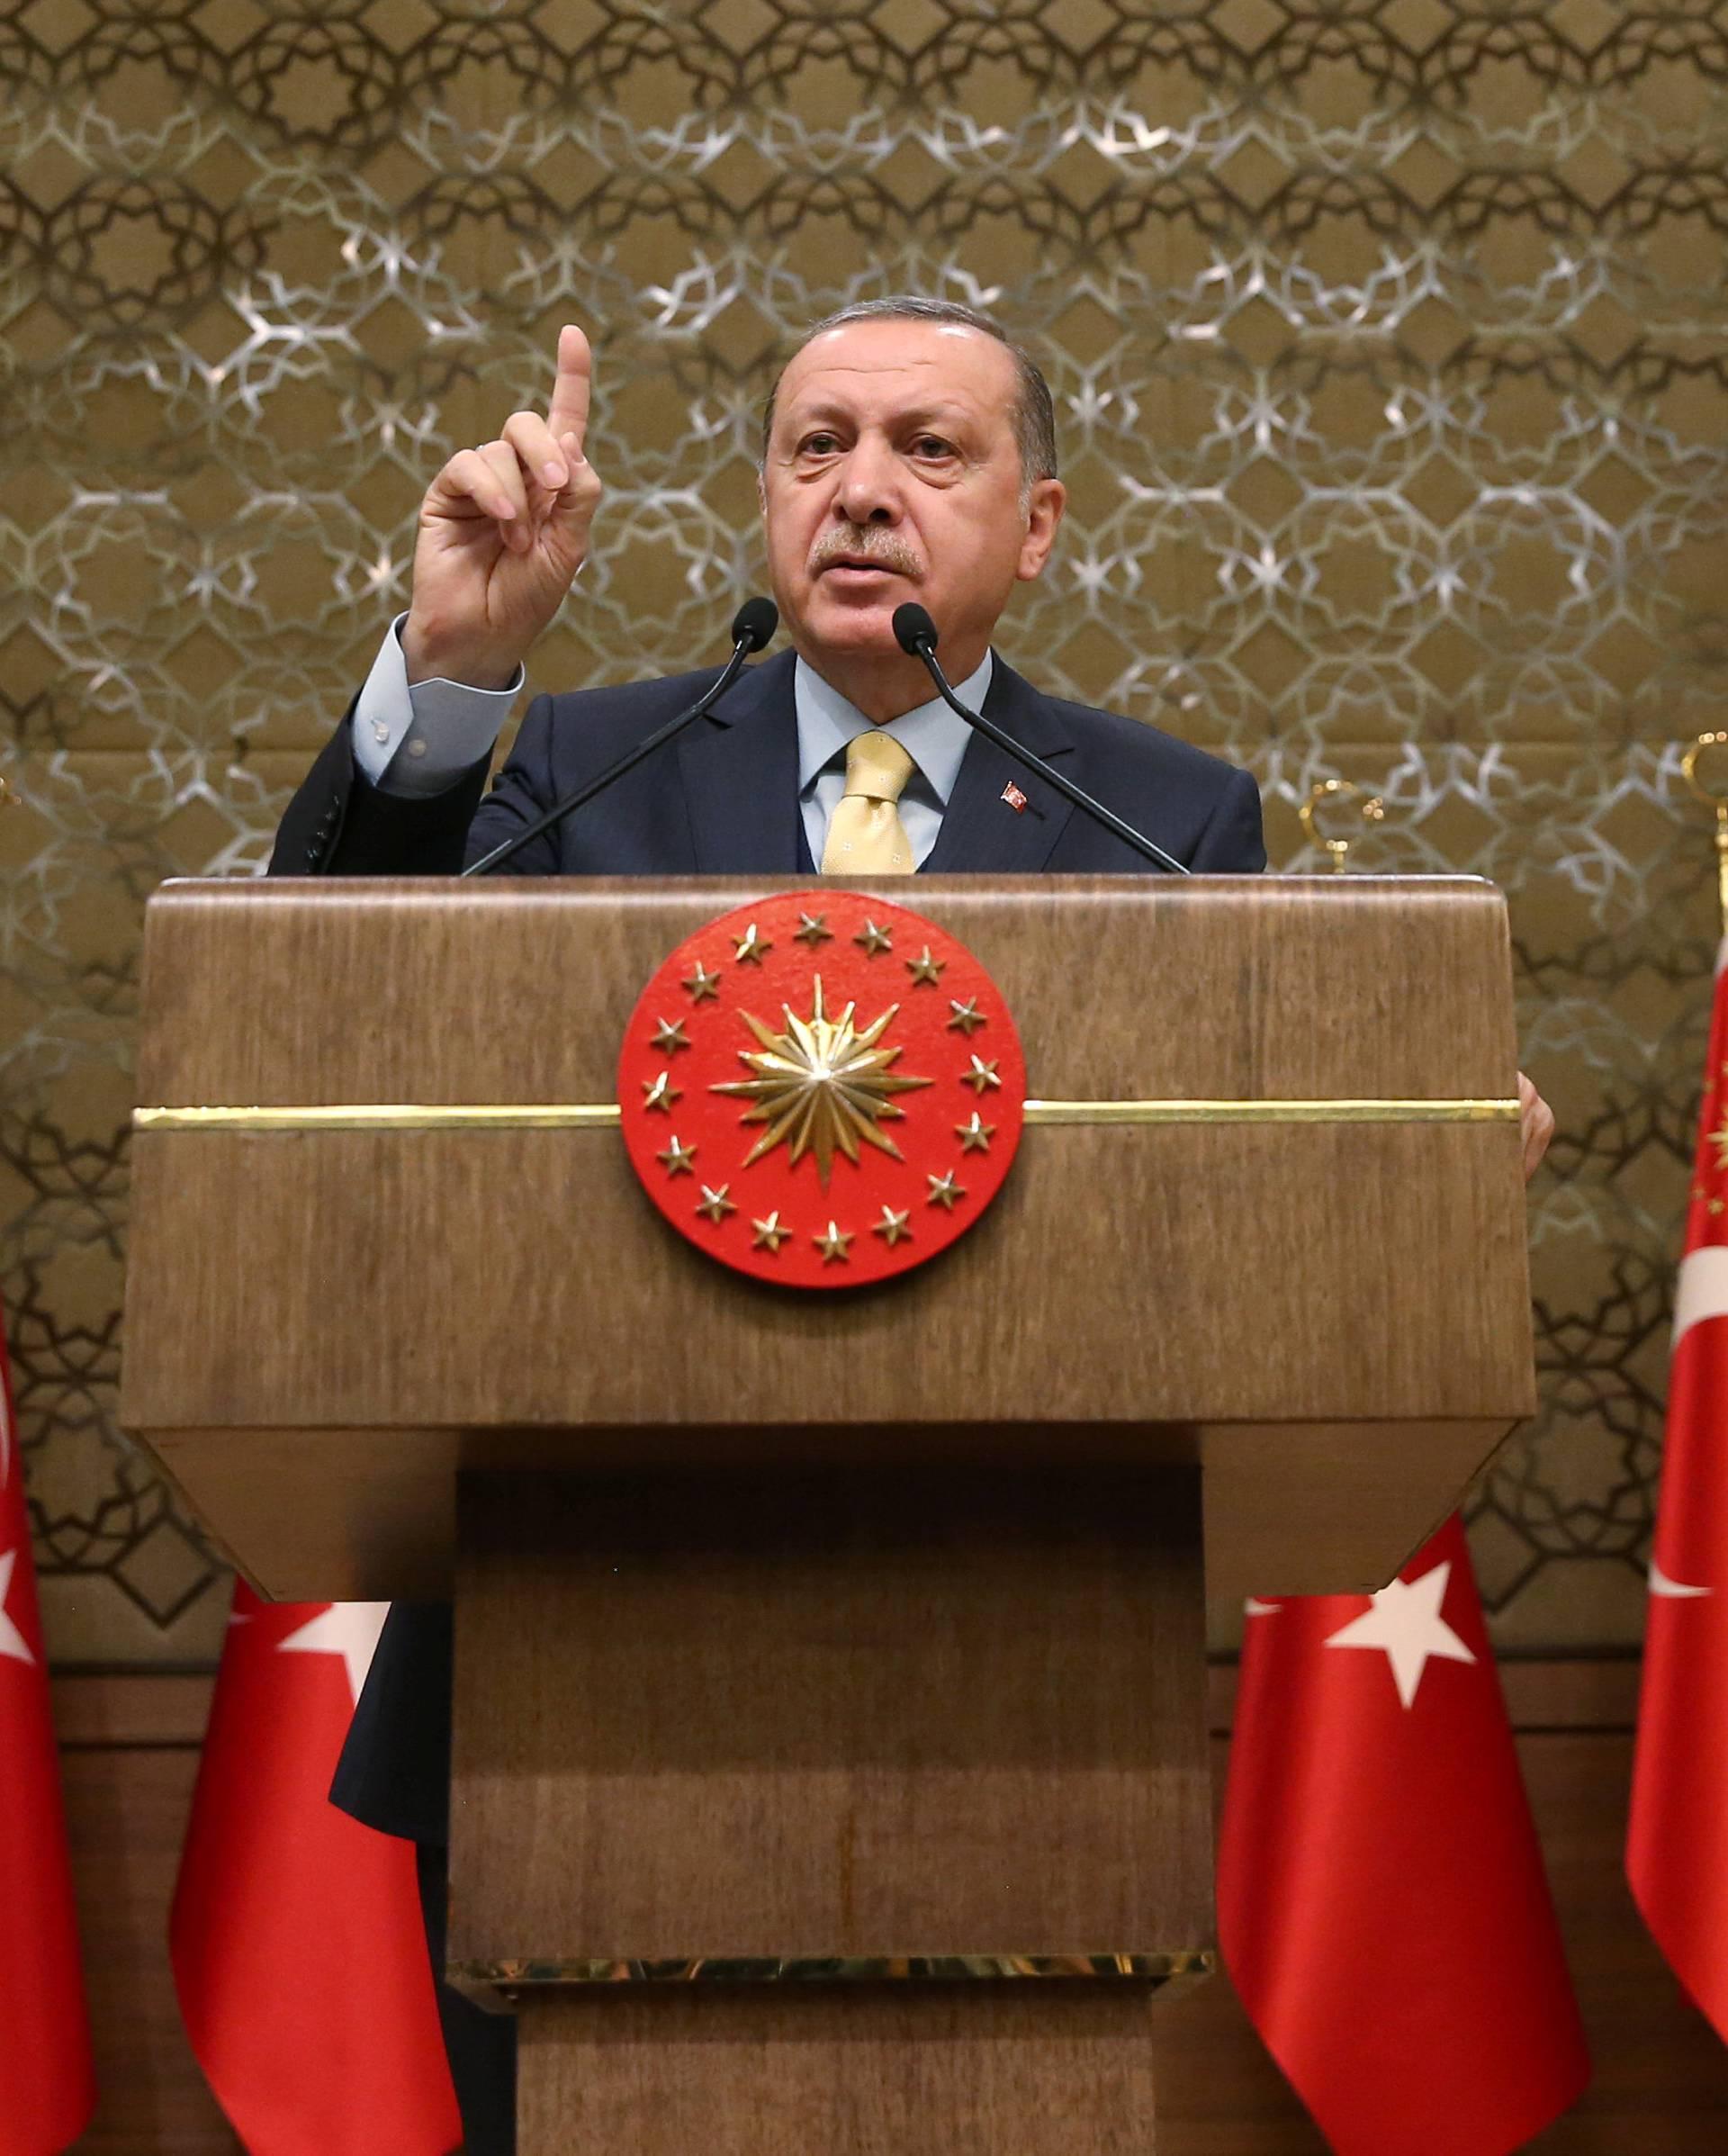 Turkish President Erdogan speaks during a meeting in Ankara